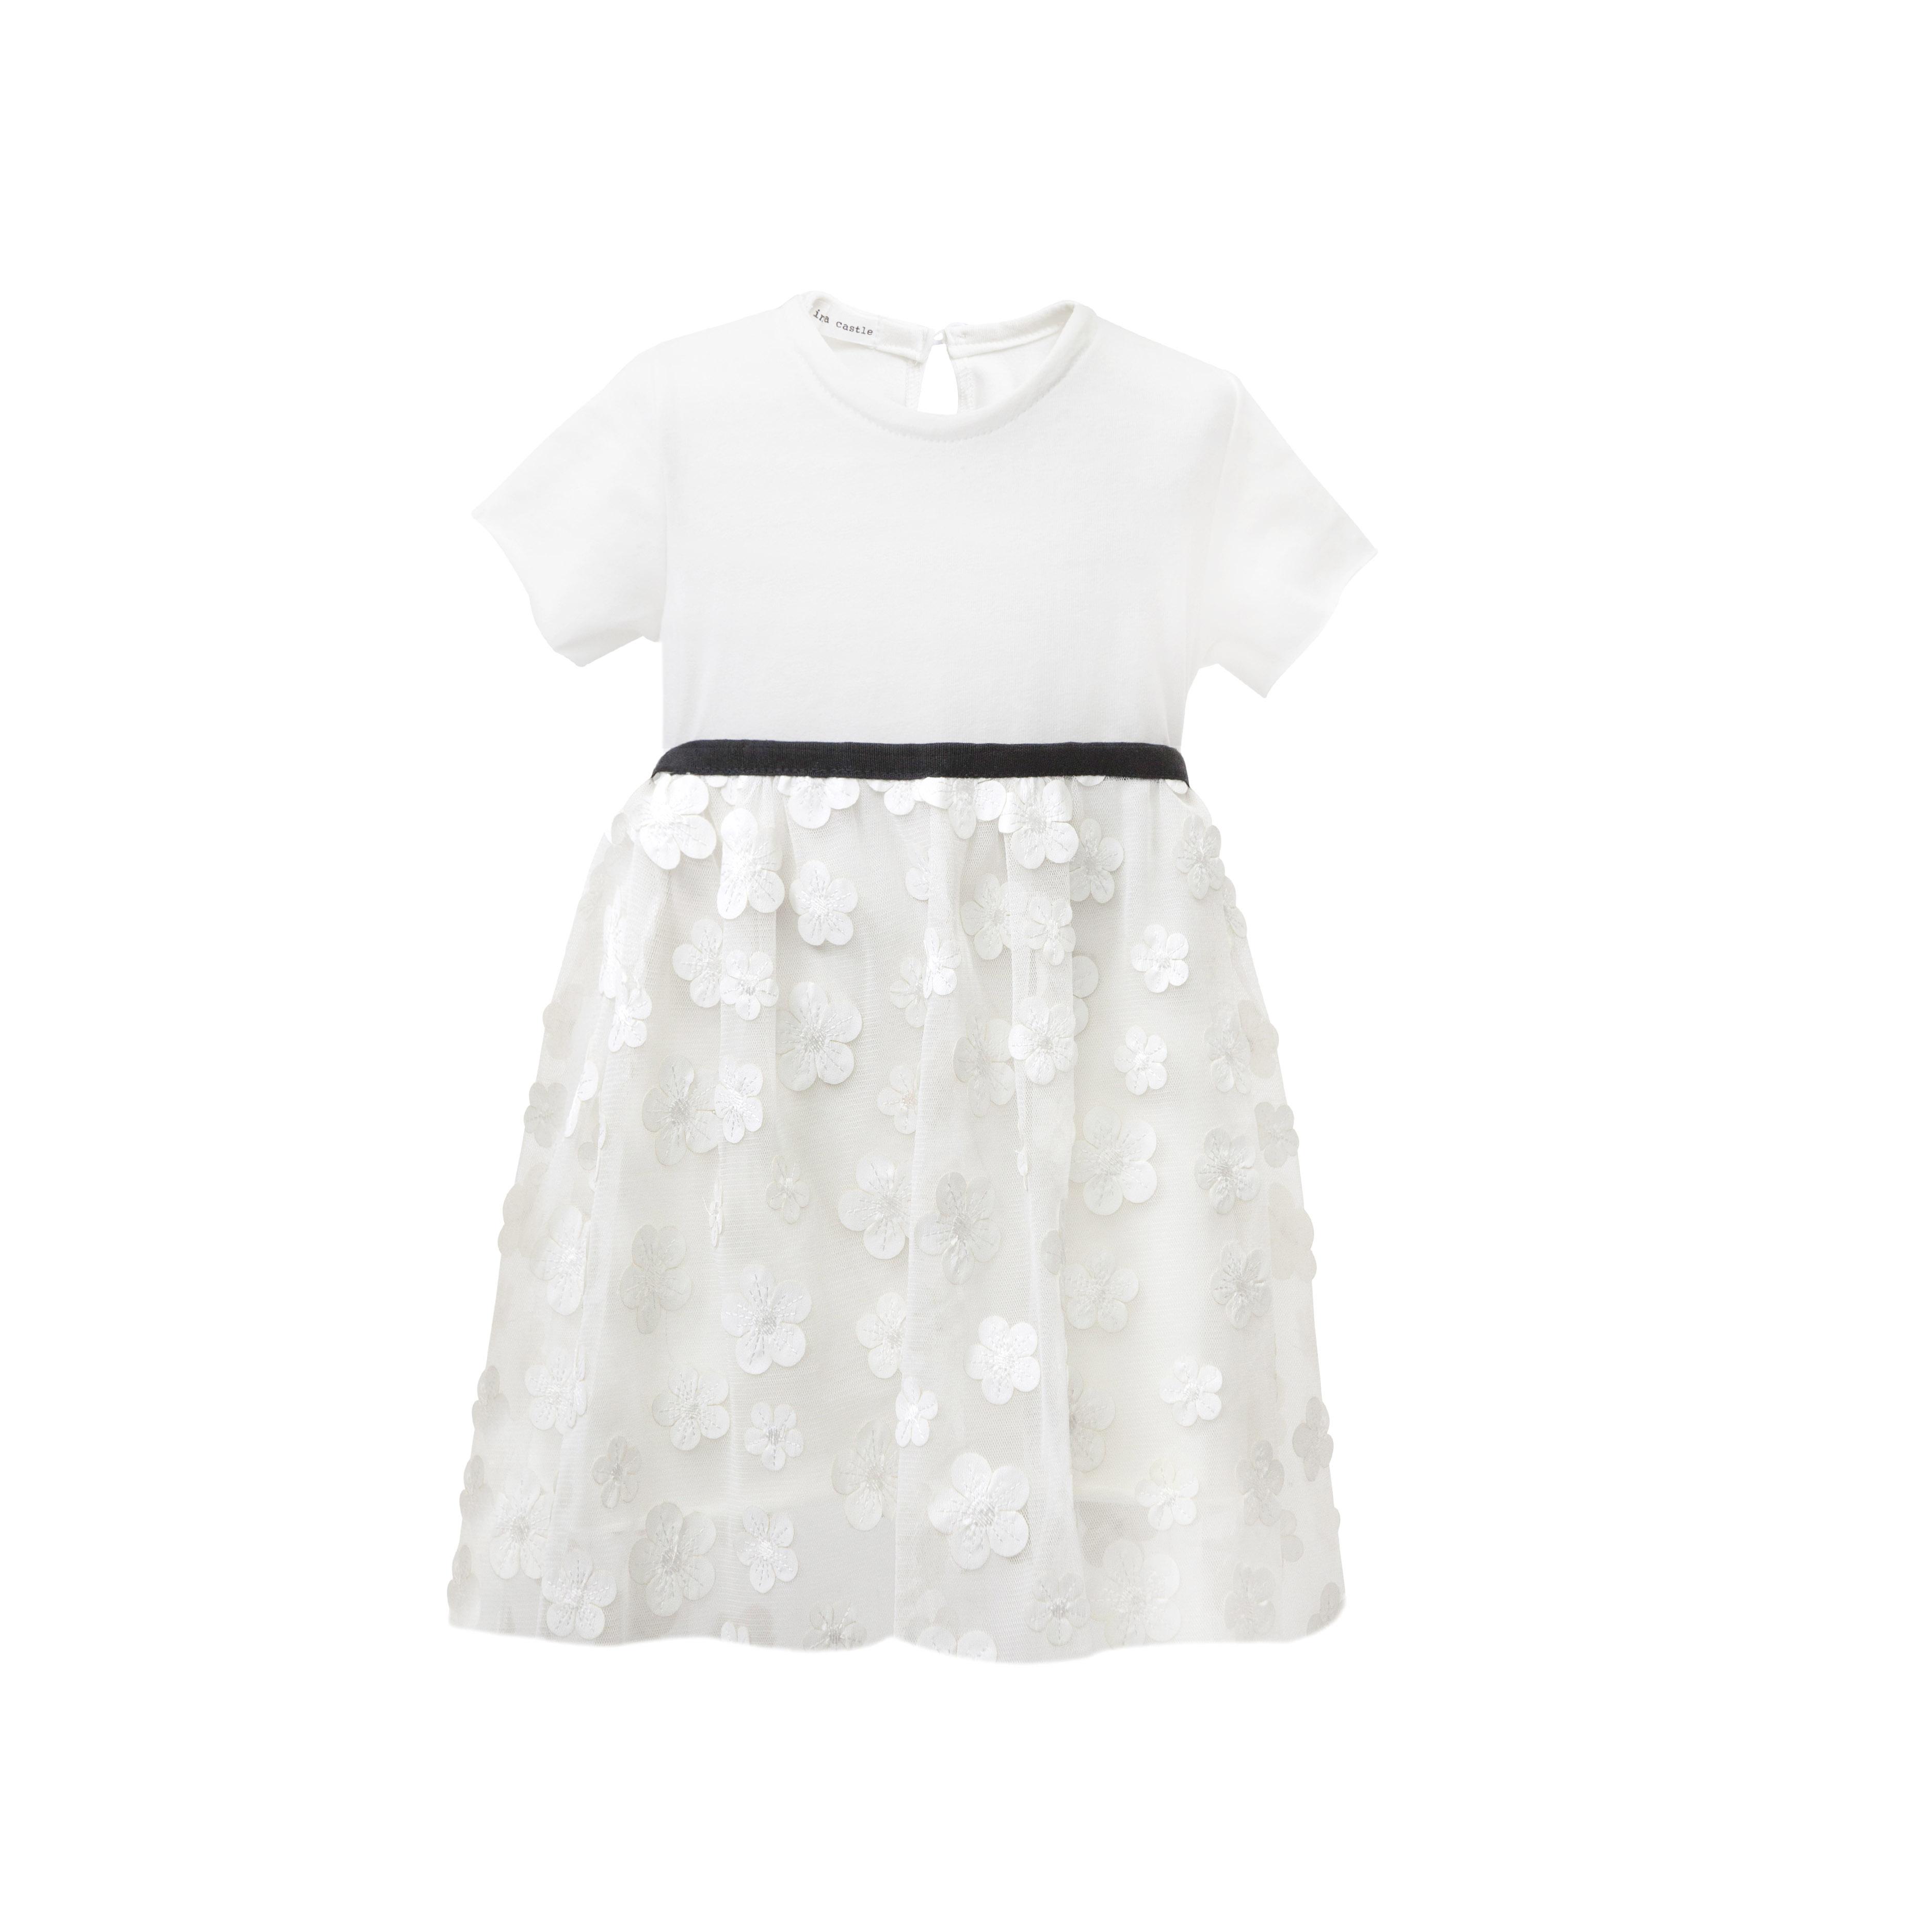 12084f2fdfba Φόρεμα λευκό με τούλινη φούστα και σχέδιο μαργαρίτες | Baby Love ...